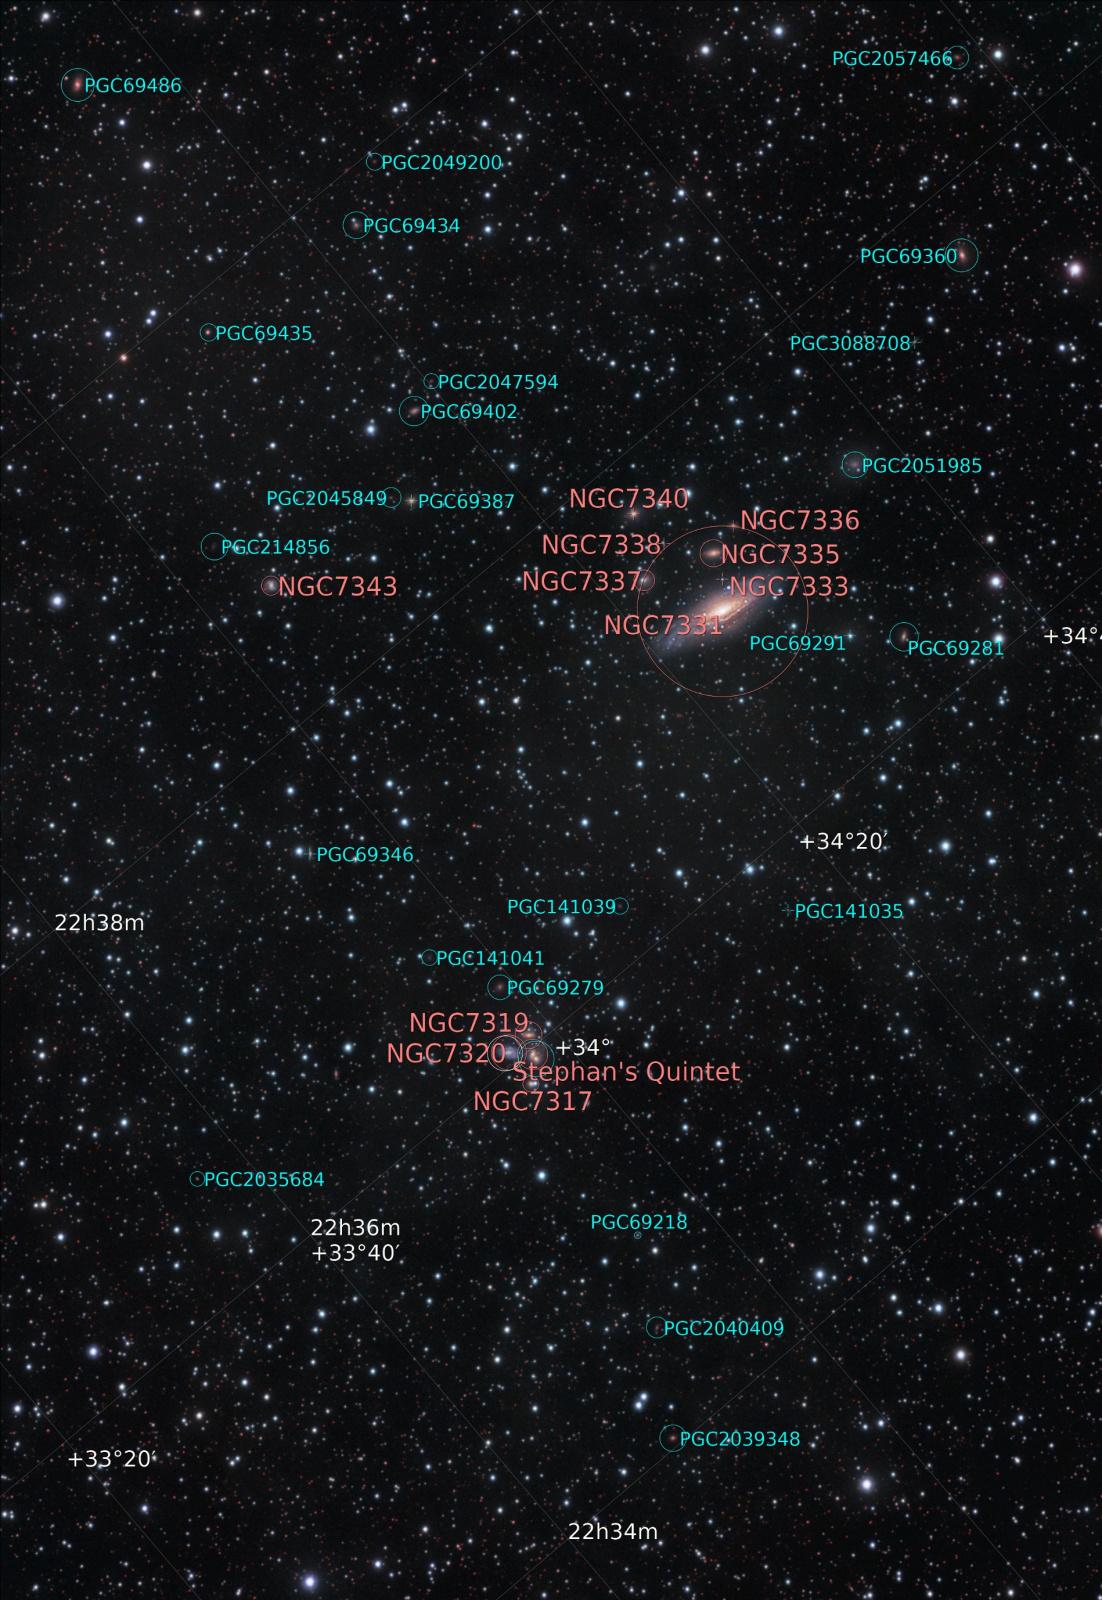 NGC7331_opisana.jpg